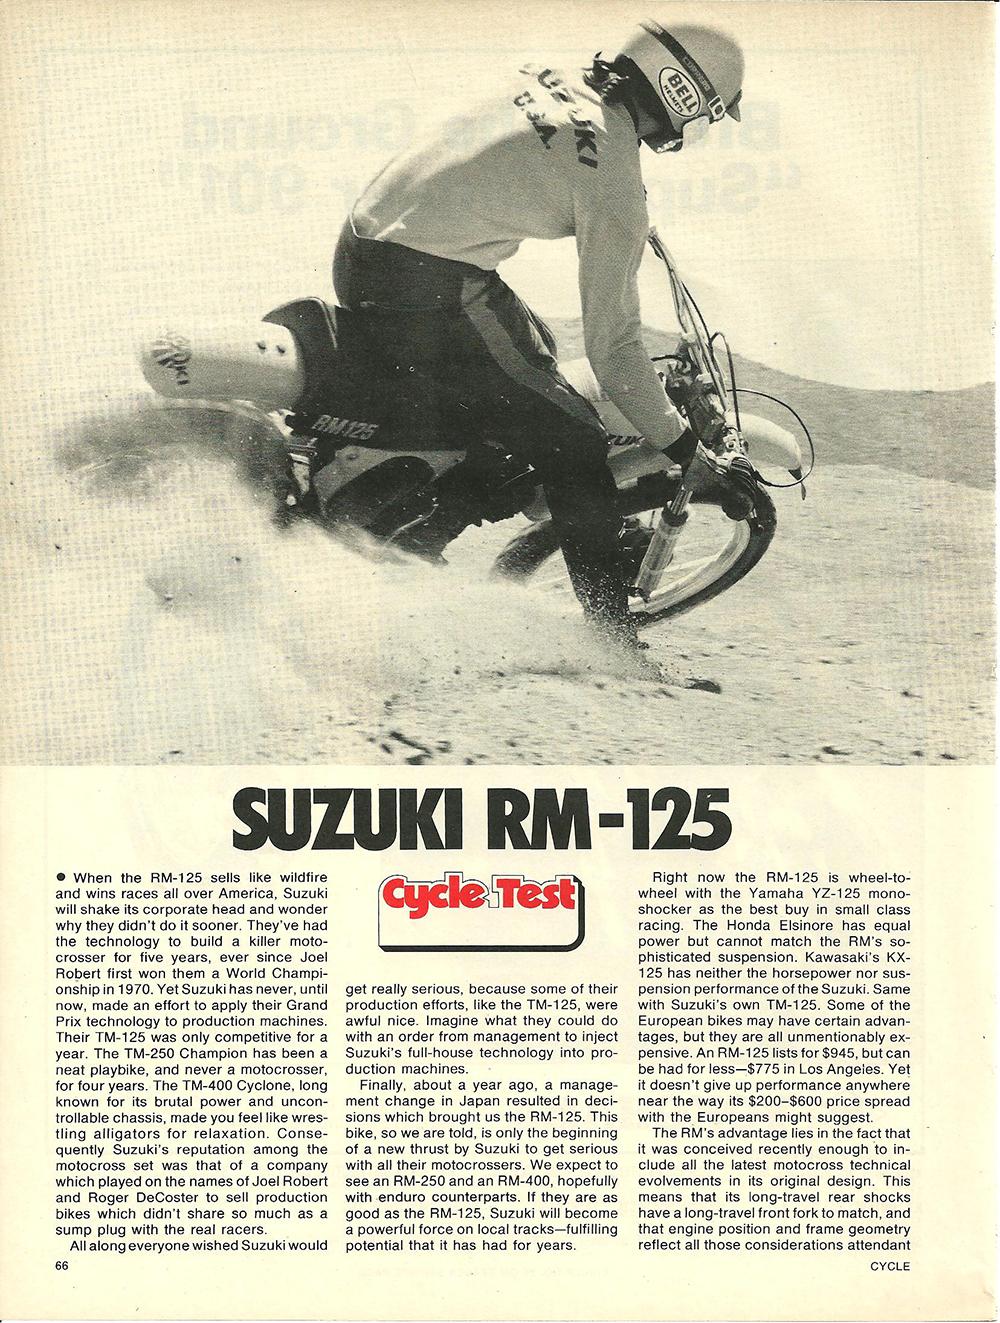 1975 Suzuki RM 125 road test 1.jpeg